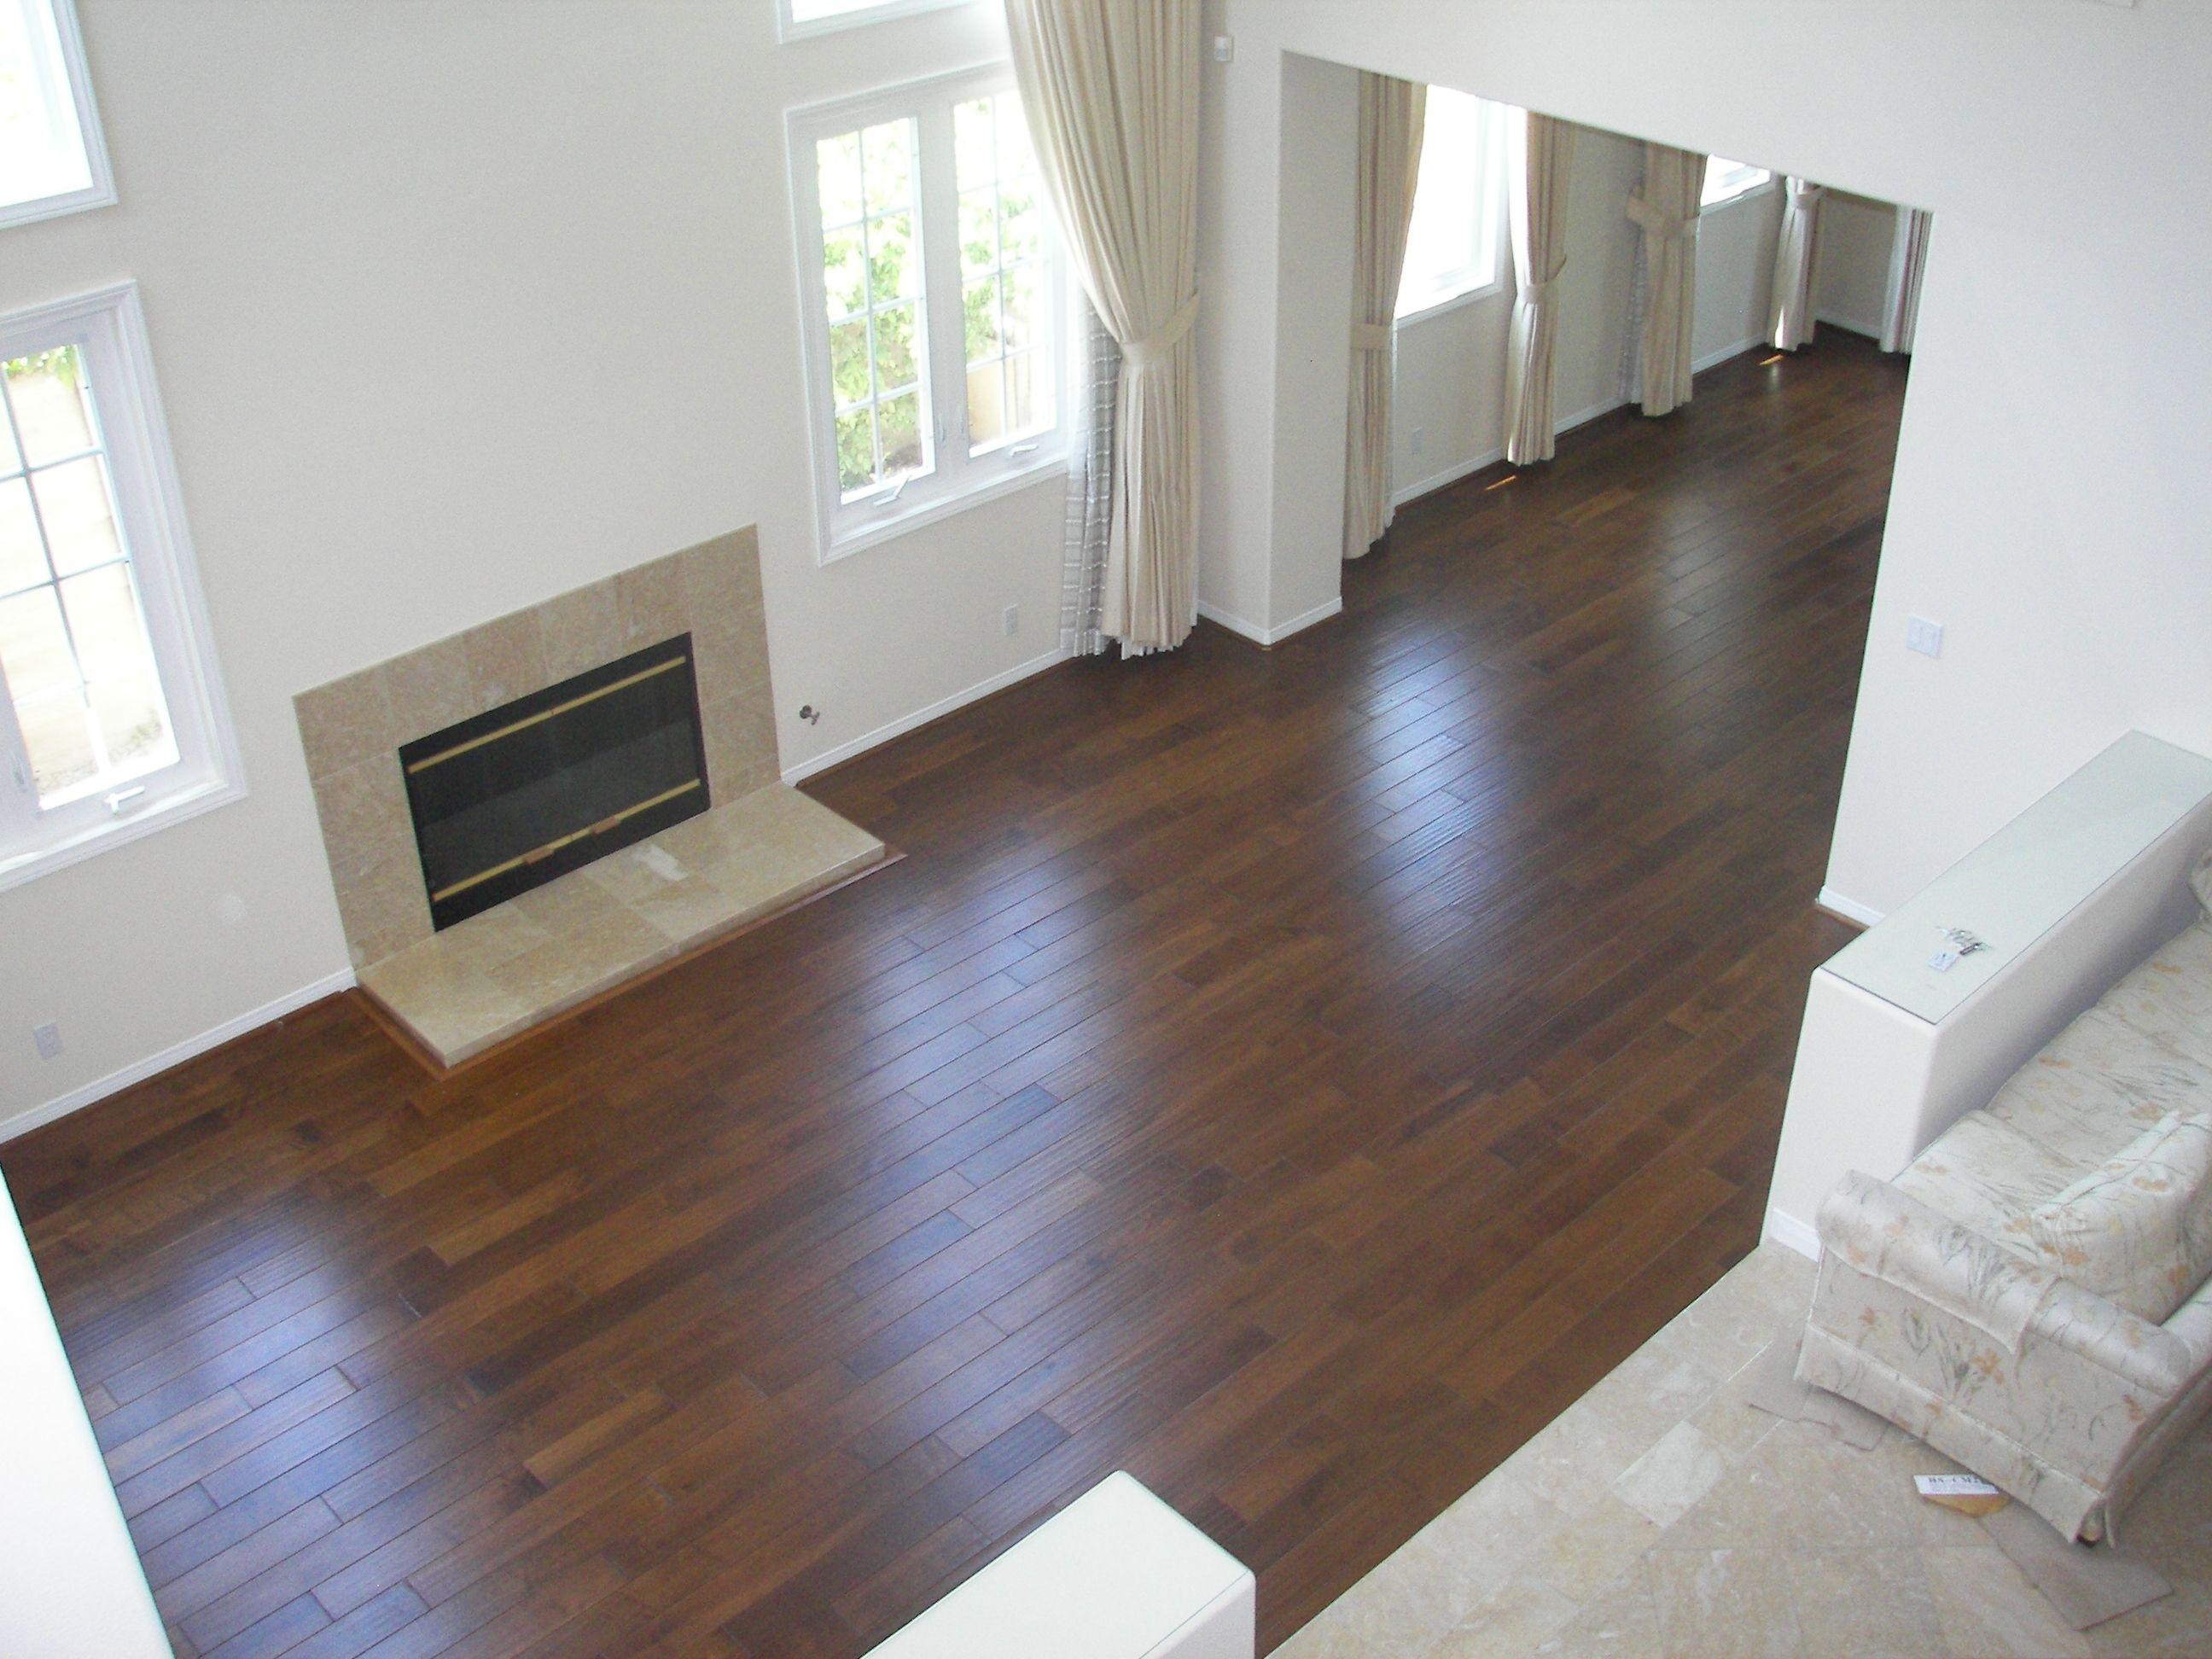 Glued Down Wood Floors | http://dreamhomesbyrob.com | Pinterest ...